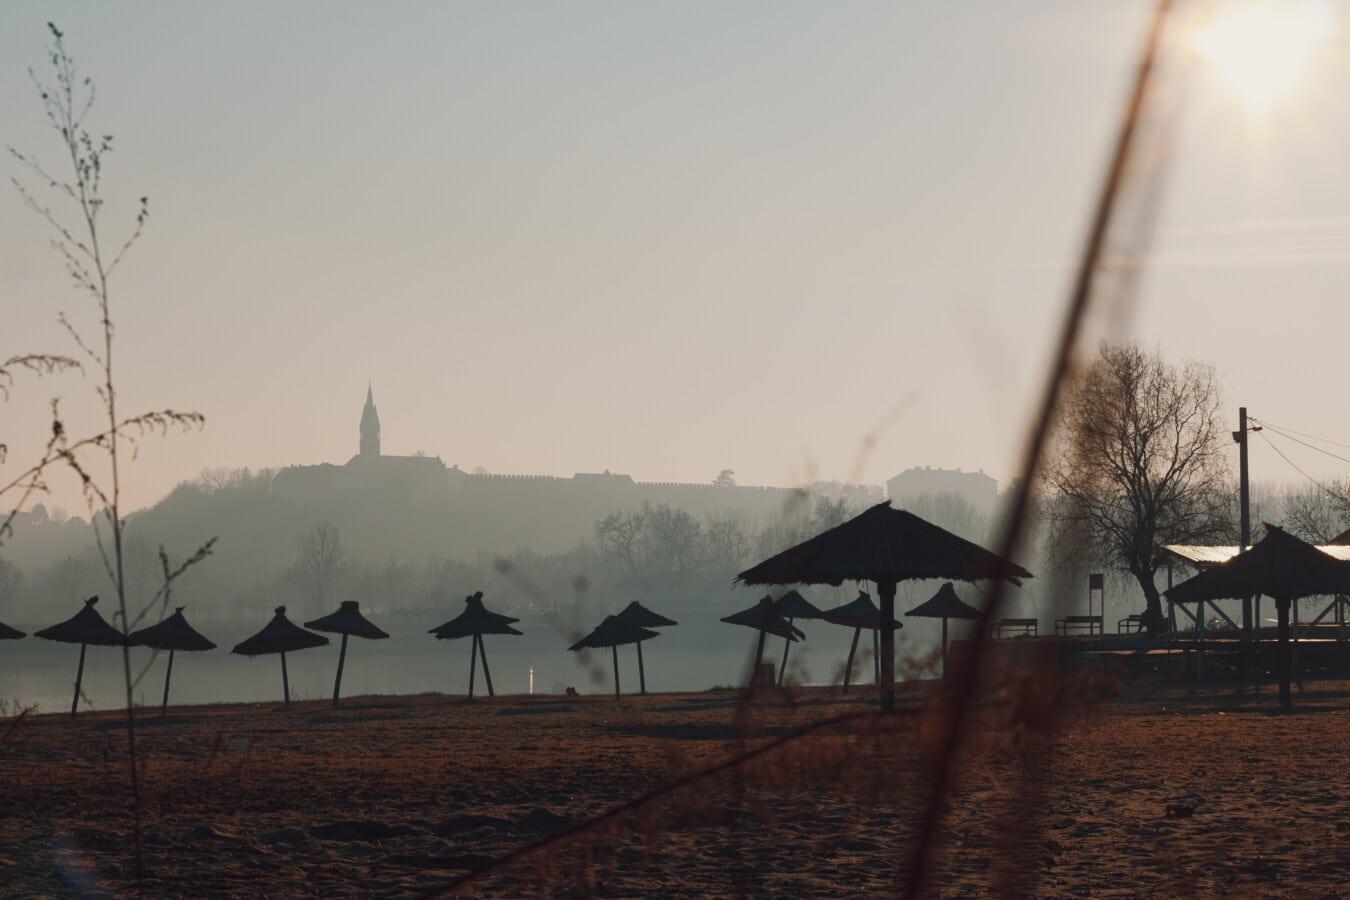 beachfront, sunset, dusk, foggy, parasol, barn, dawn, landscape, beach, fog